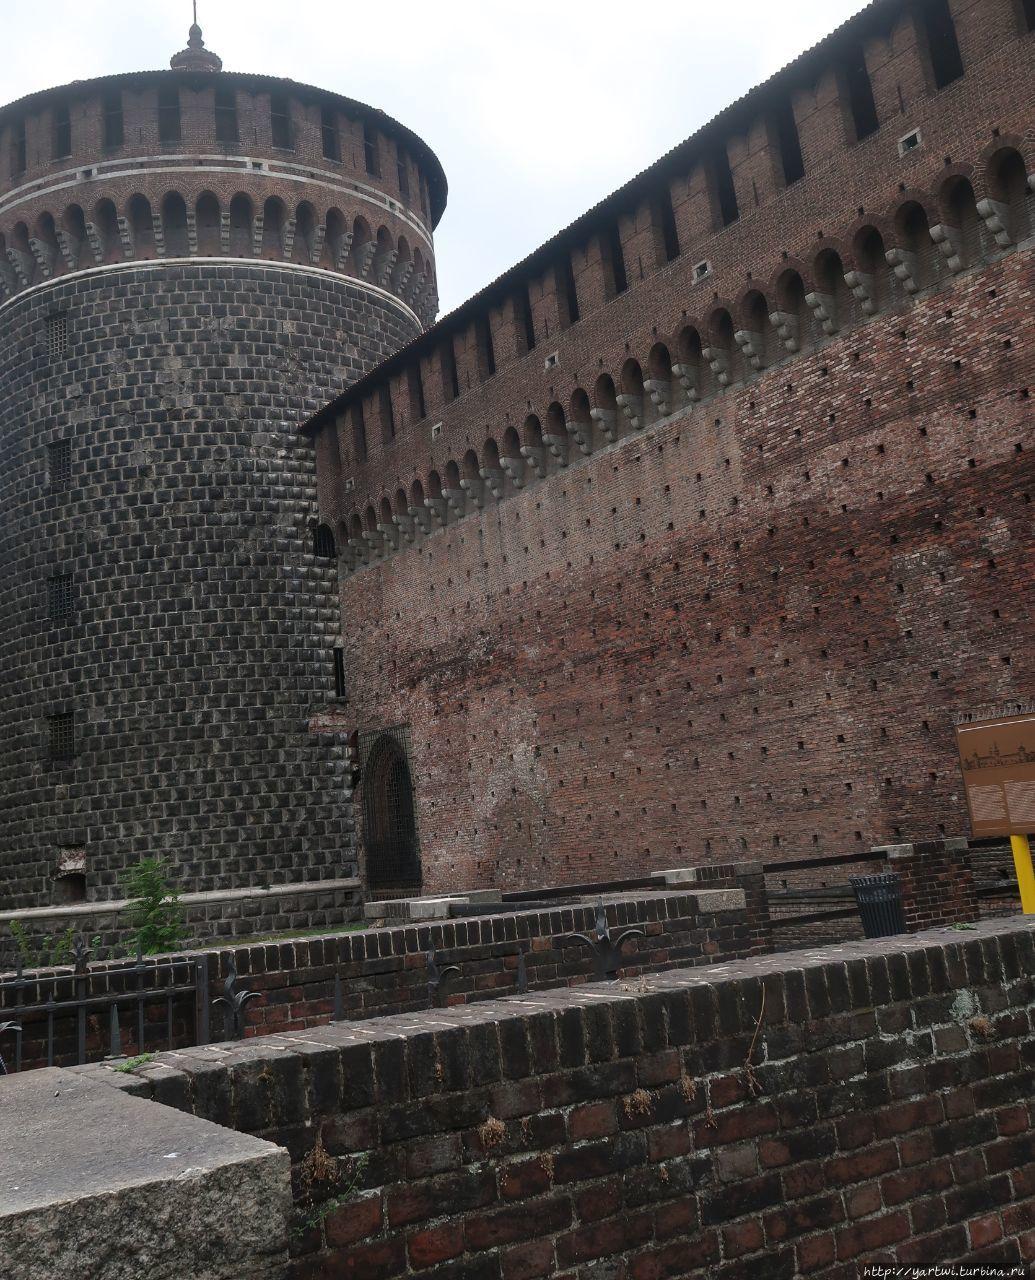 Облик крепости Сфорца взя